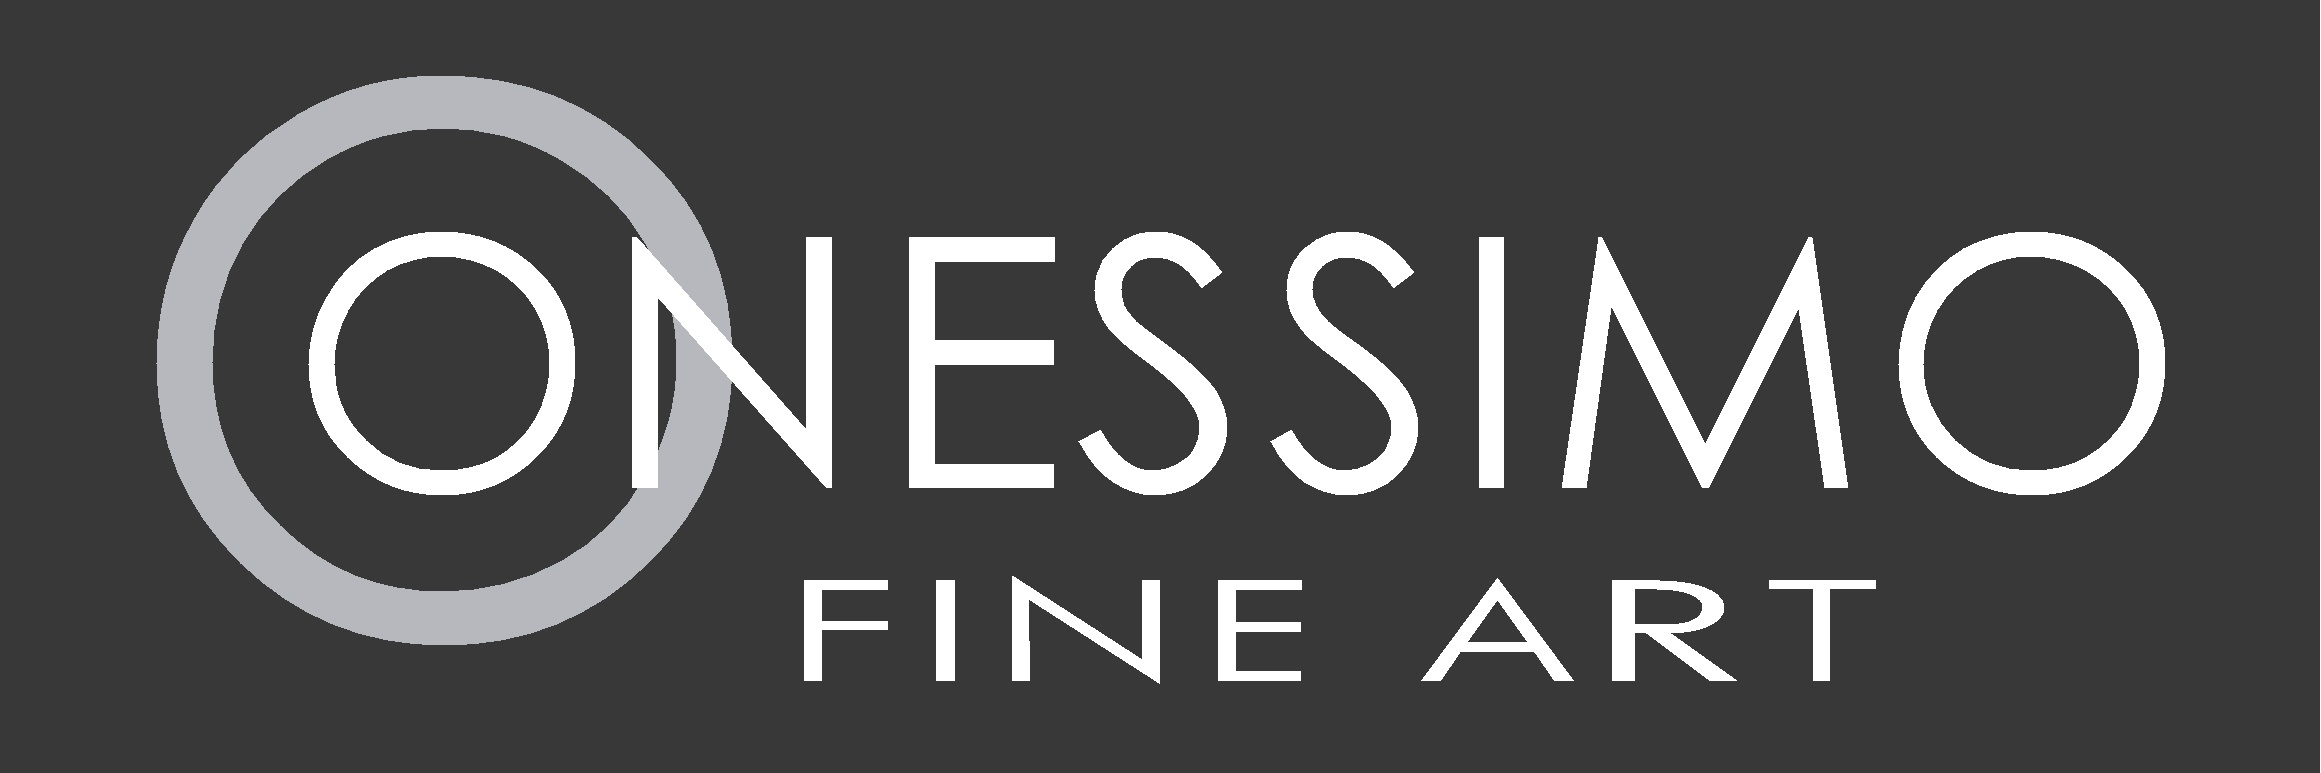 Onessimo Fine Art